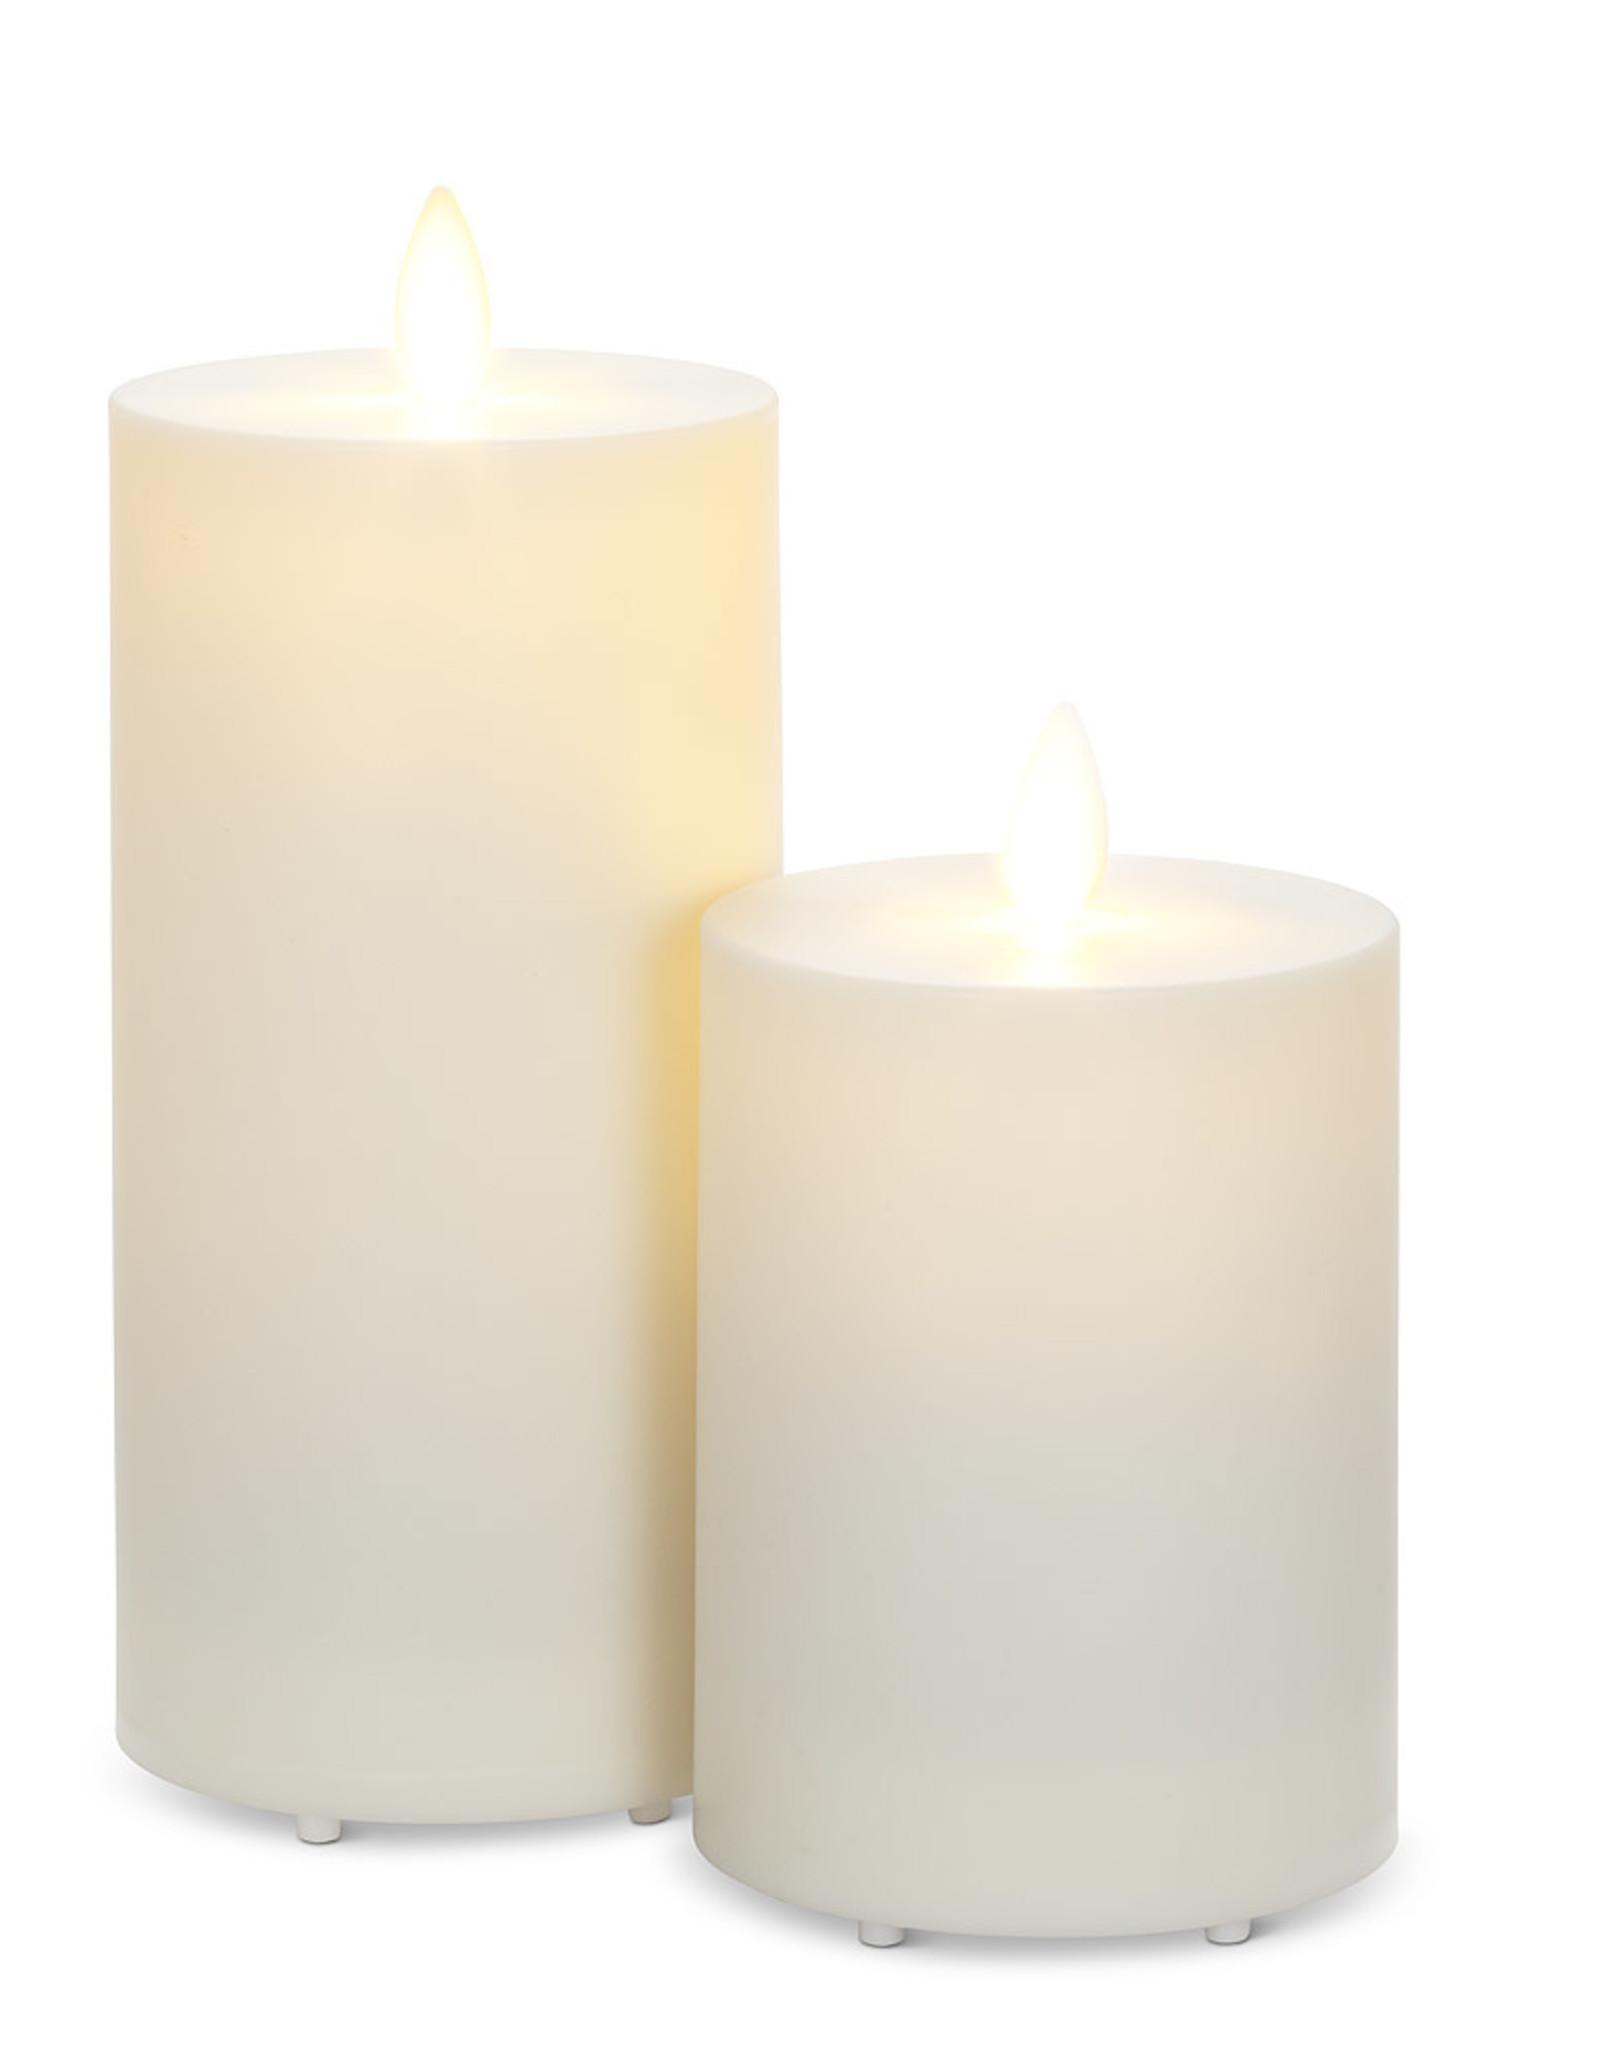 Rainlite Outdoor Candle 3 x 7''